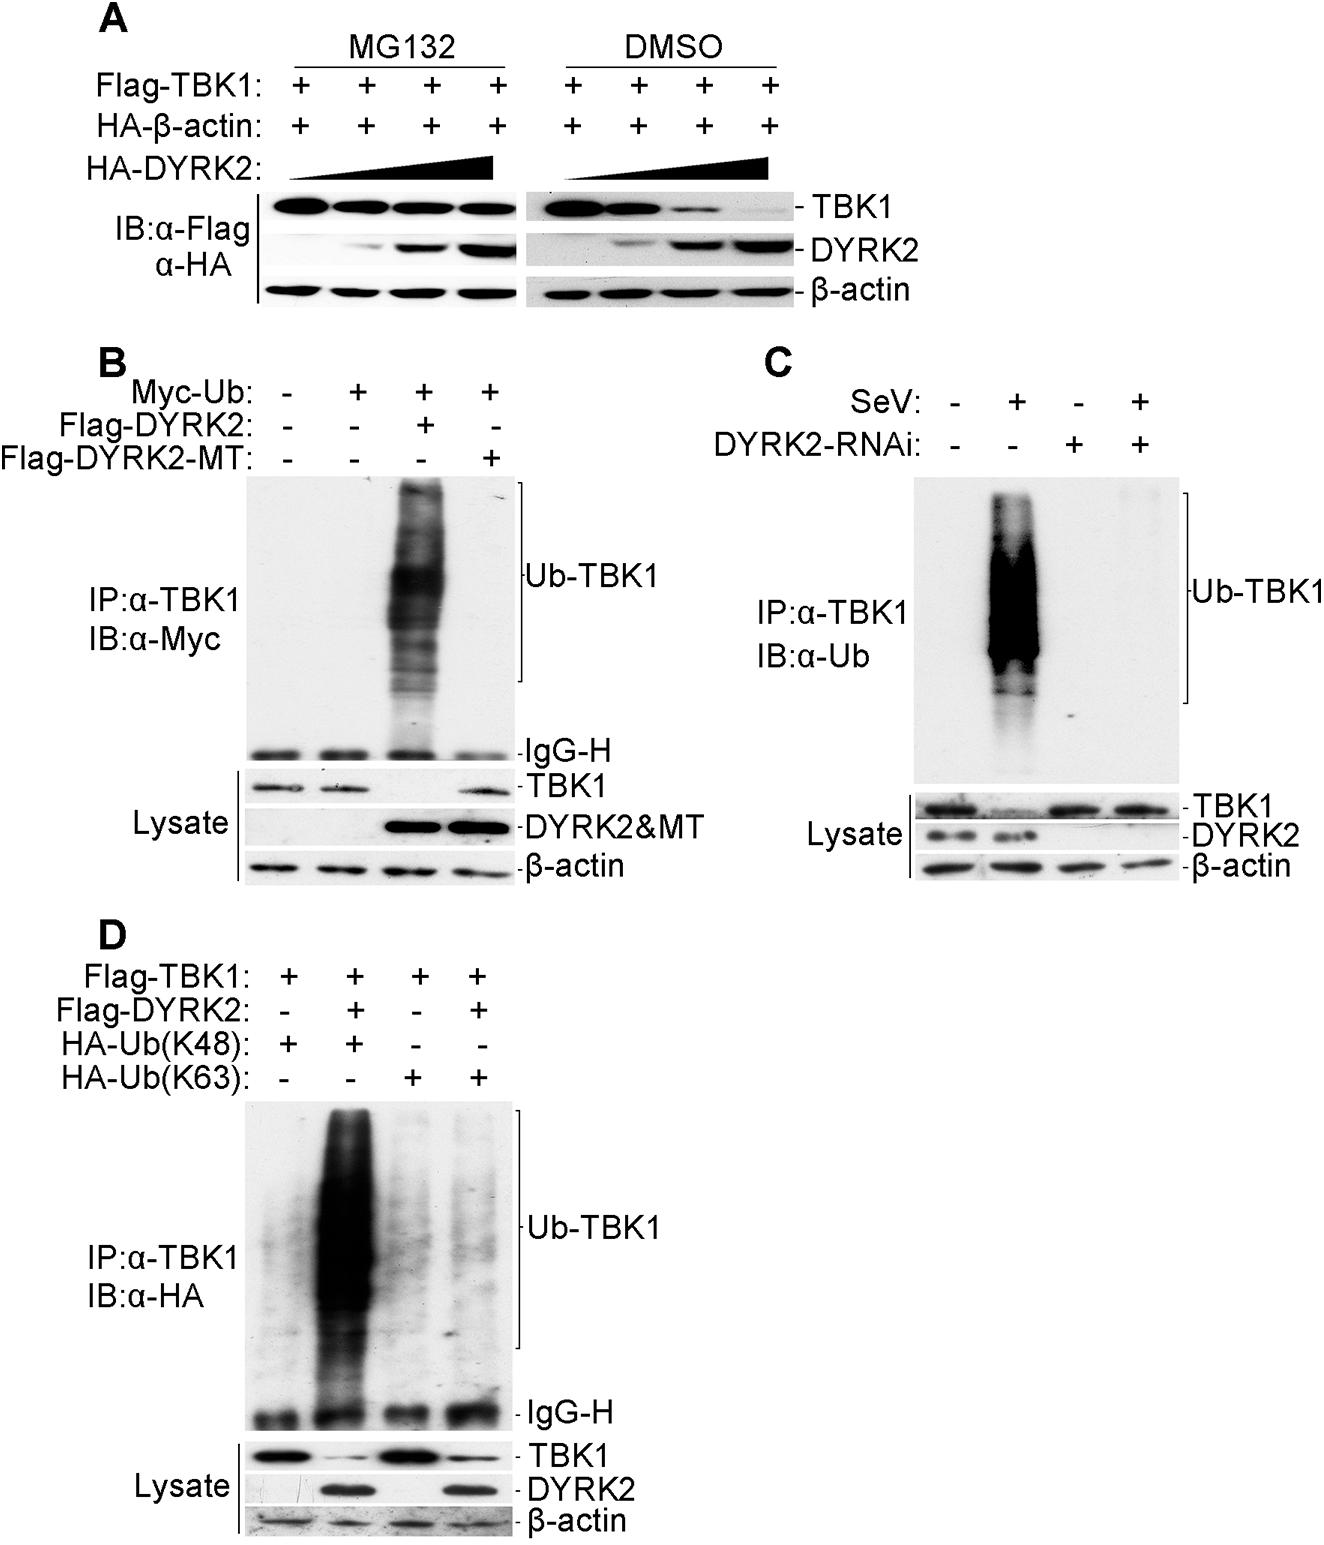 DYRK2 promoted TBK1 degradation via K48-linked ubiquitination.